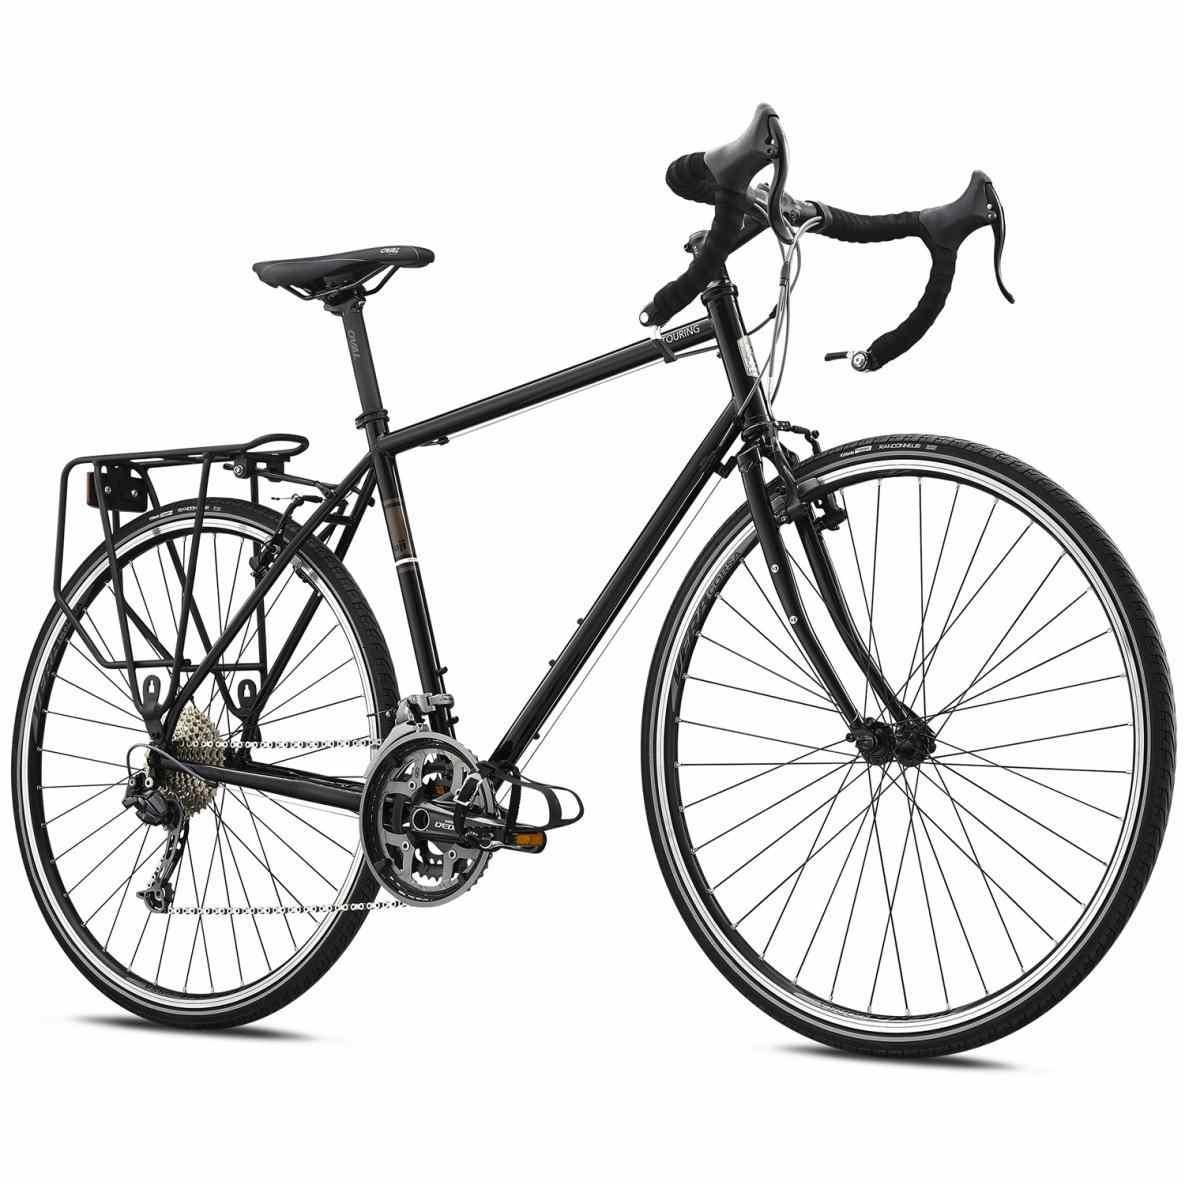 1185x1185 Bar Commuter Bikerhsustainthefutureus Public Road Bicycle Drawing